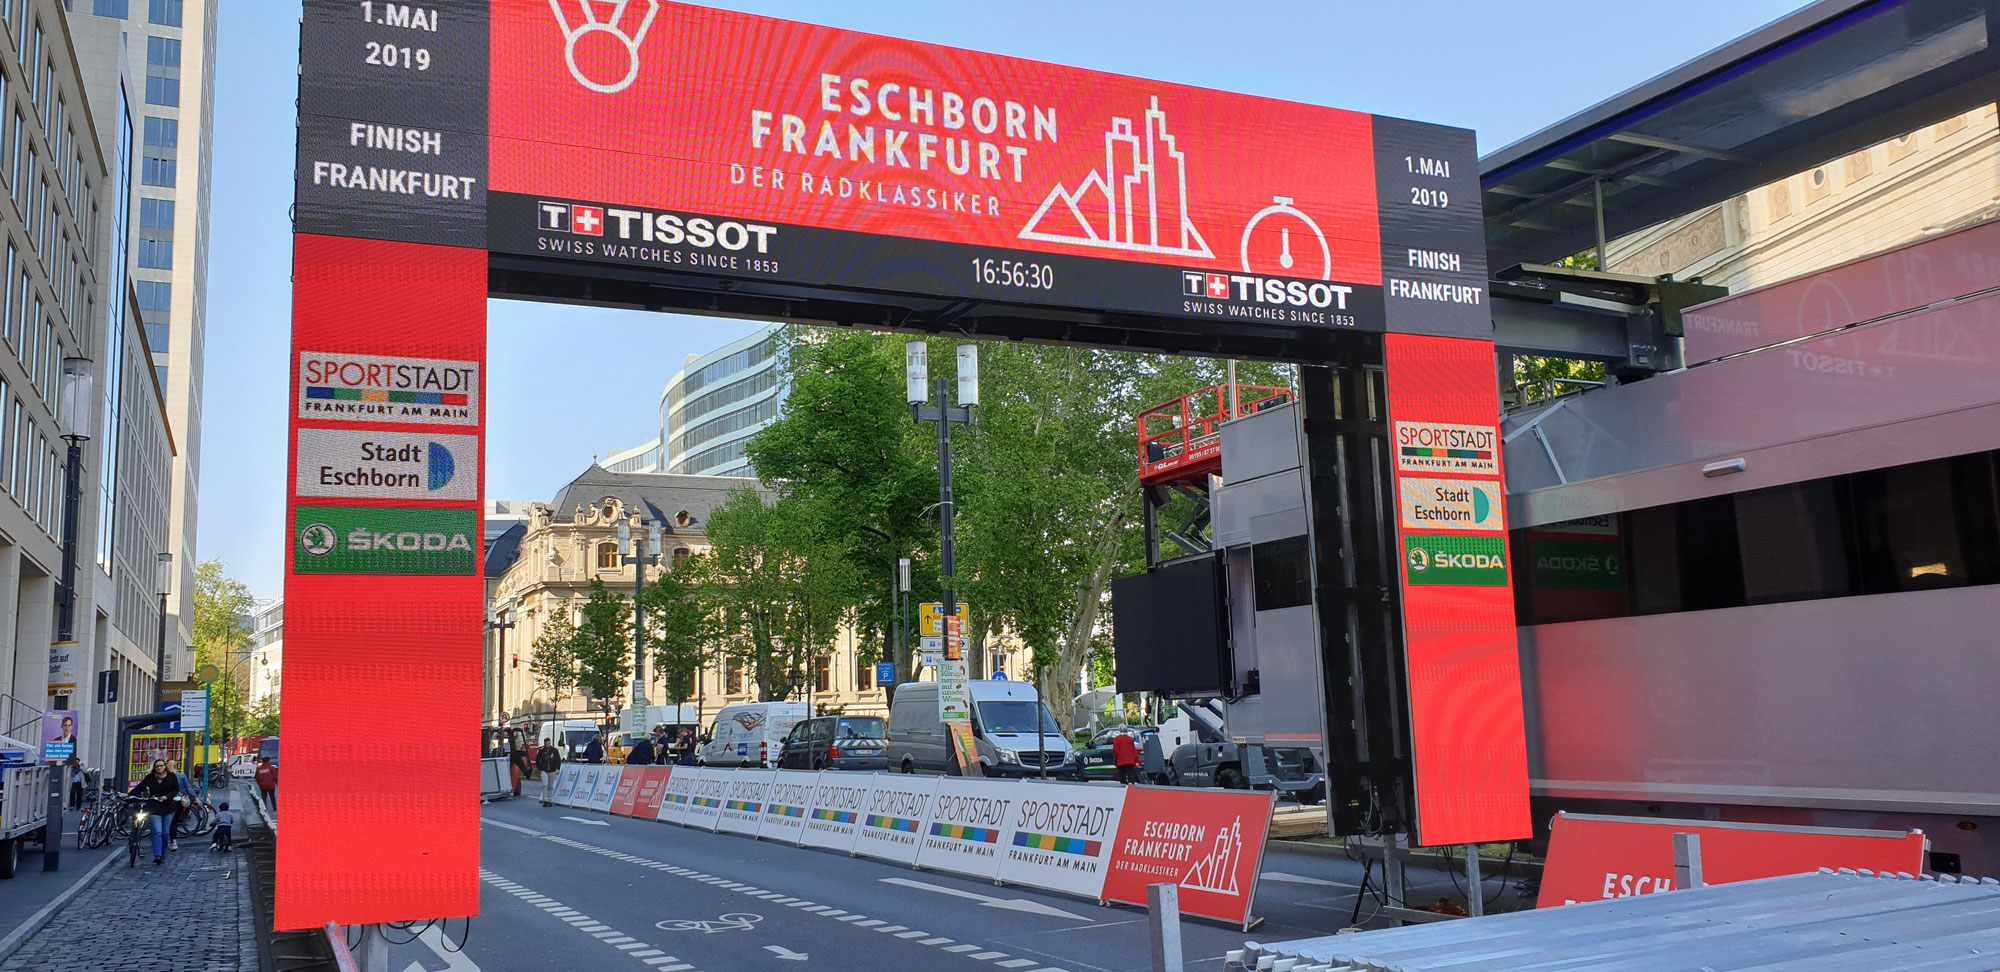 Eschborn/Frankfurt 2019